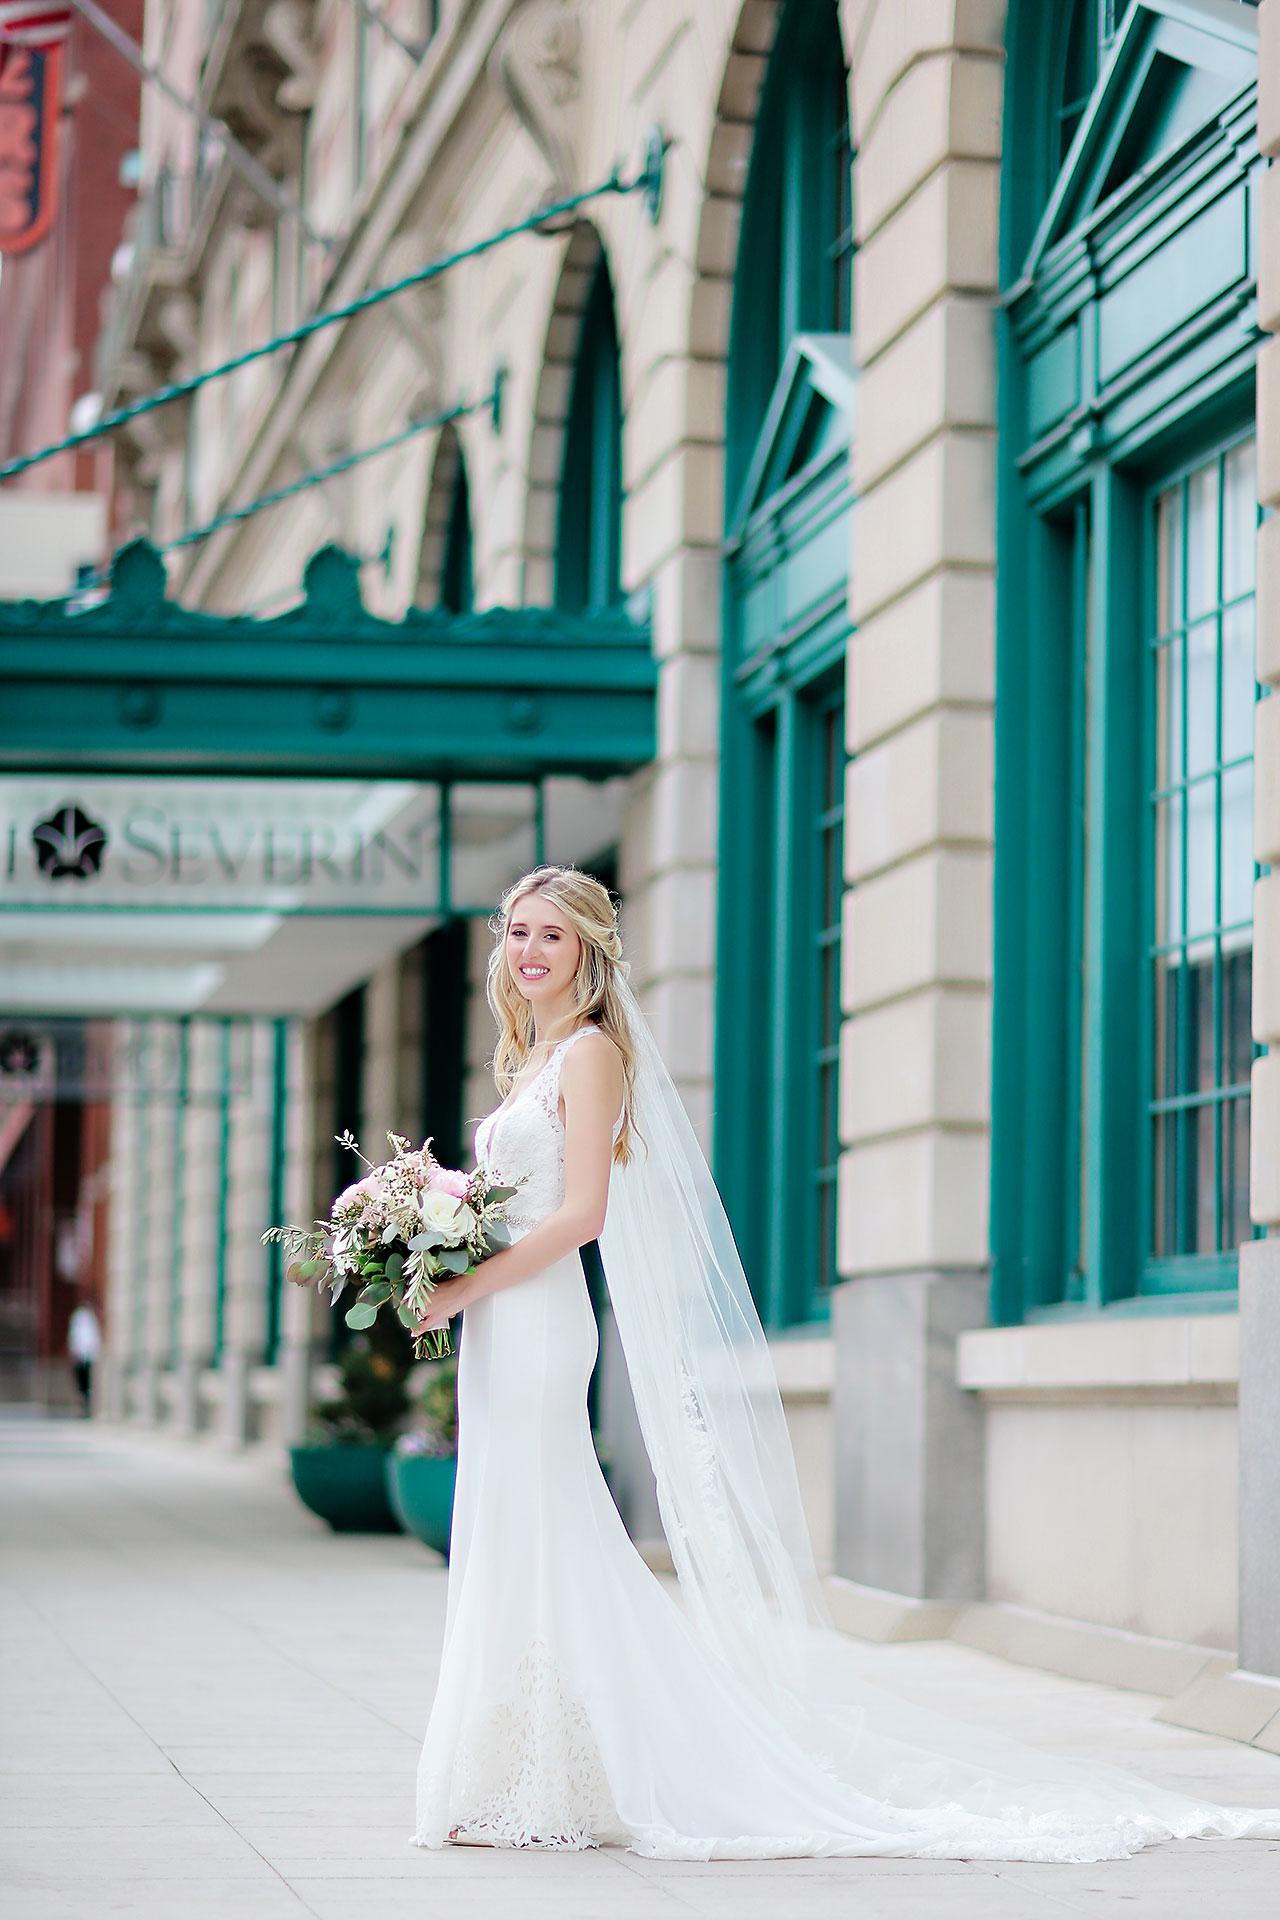 Allison Jeff Union Station Crowne Plaza Indianapolis wedding 097